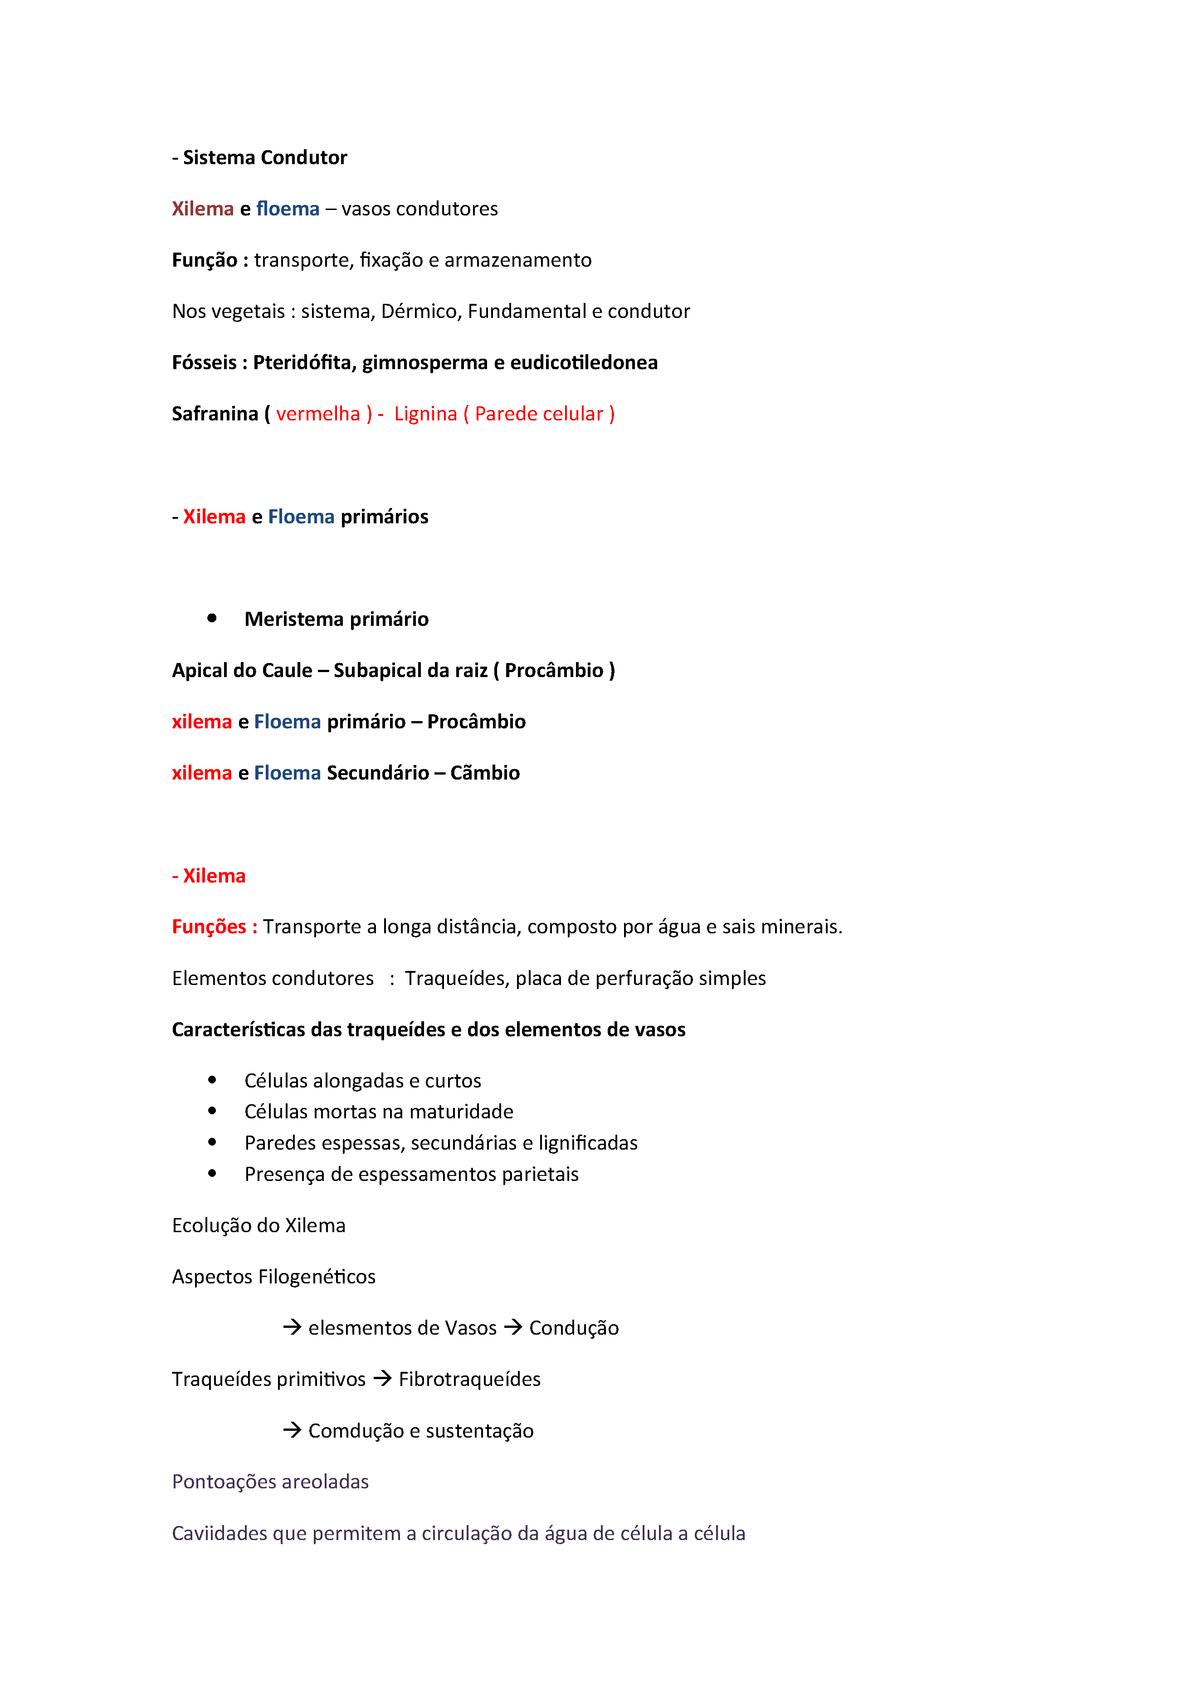 P02 Anatomia Vegetal Ib610 Ufrrj Studocu